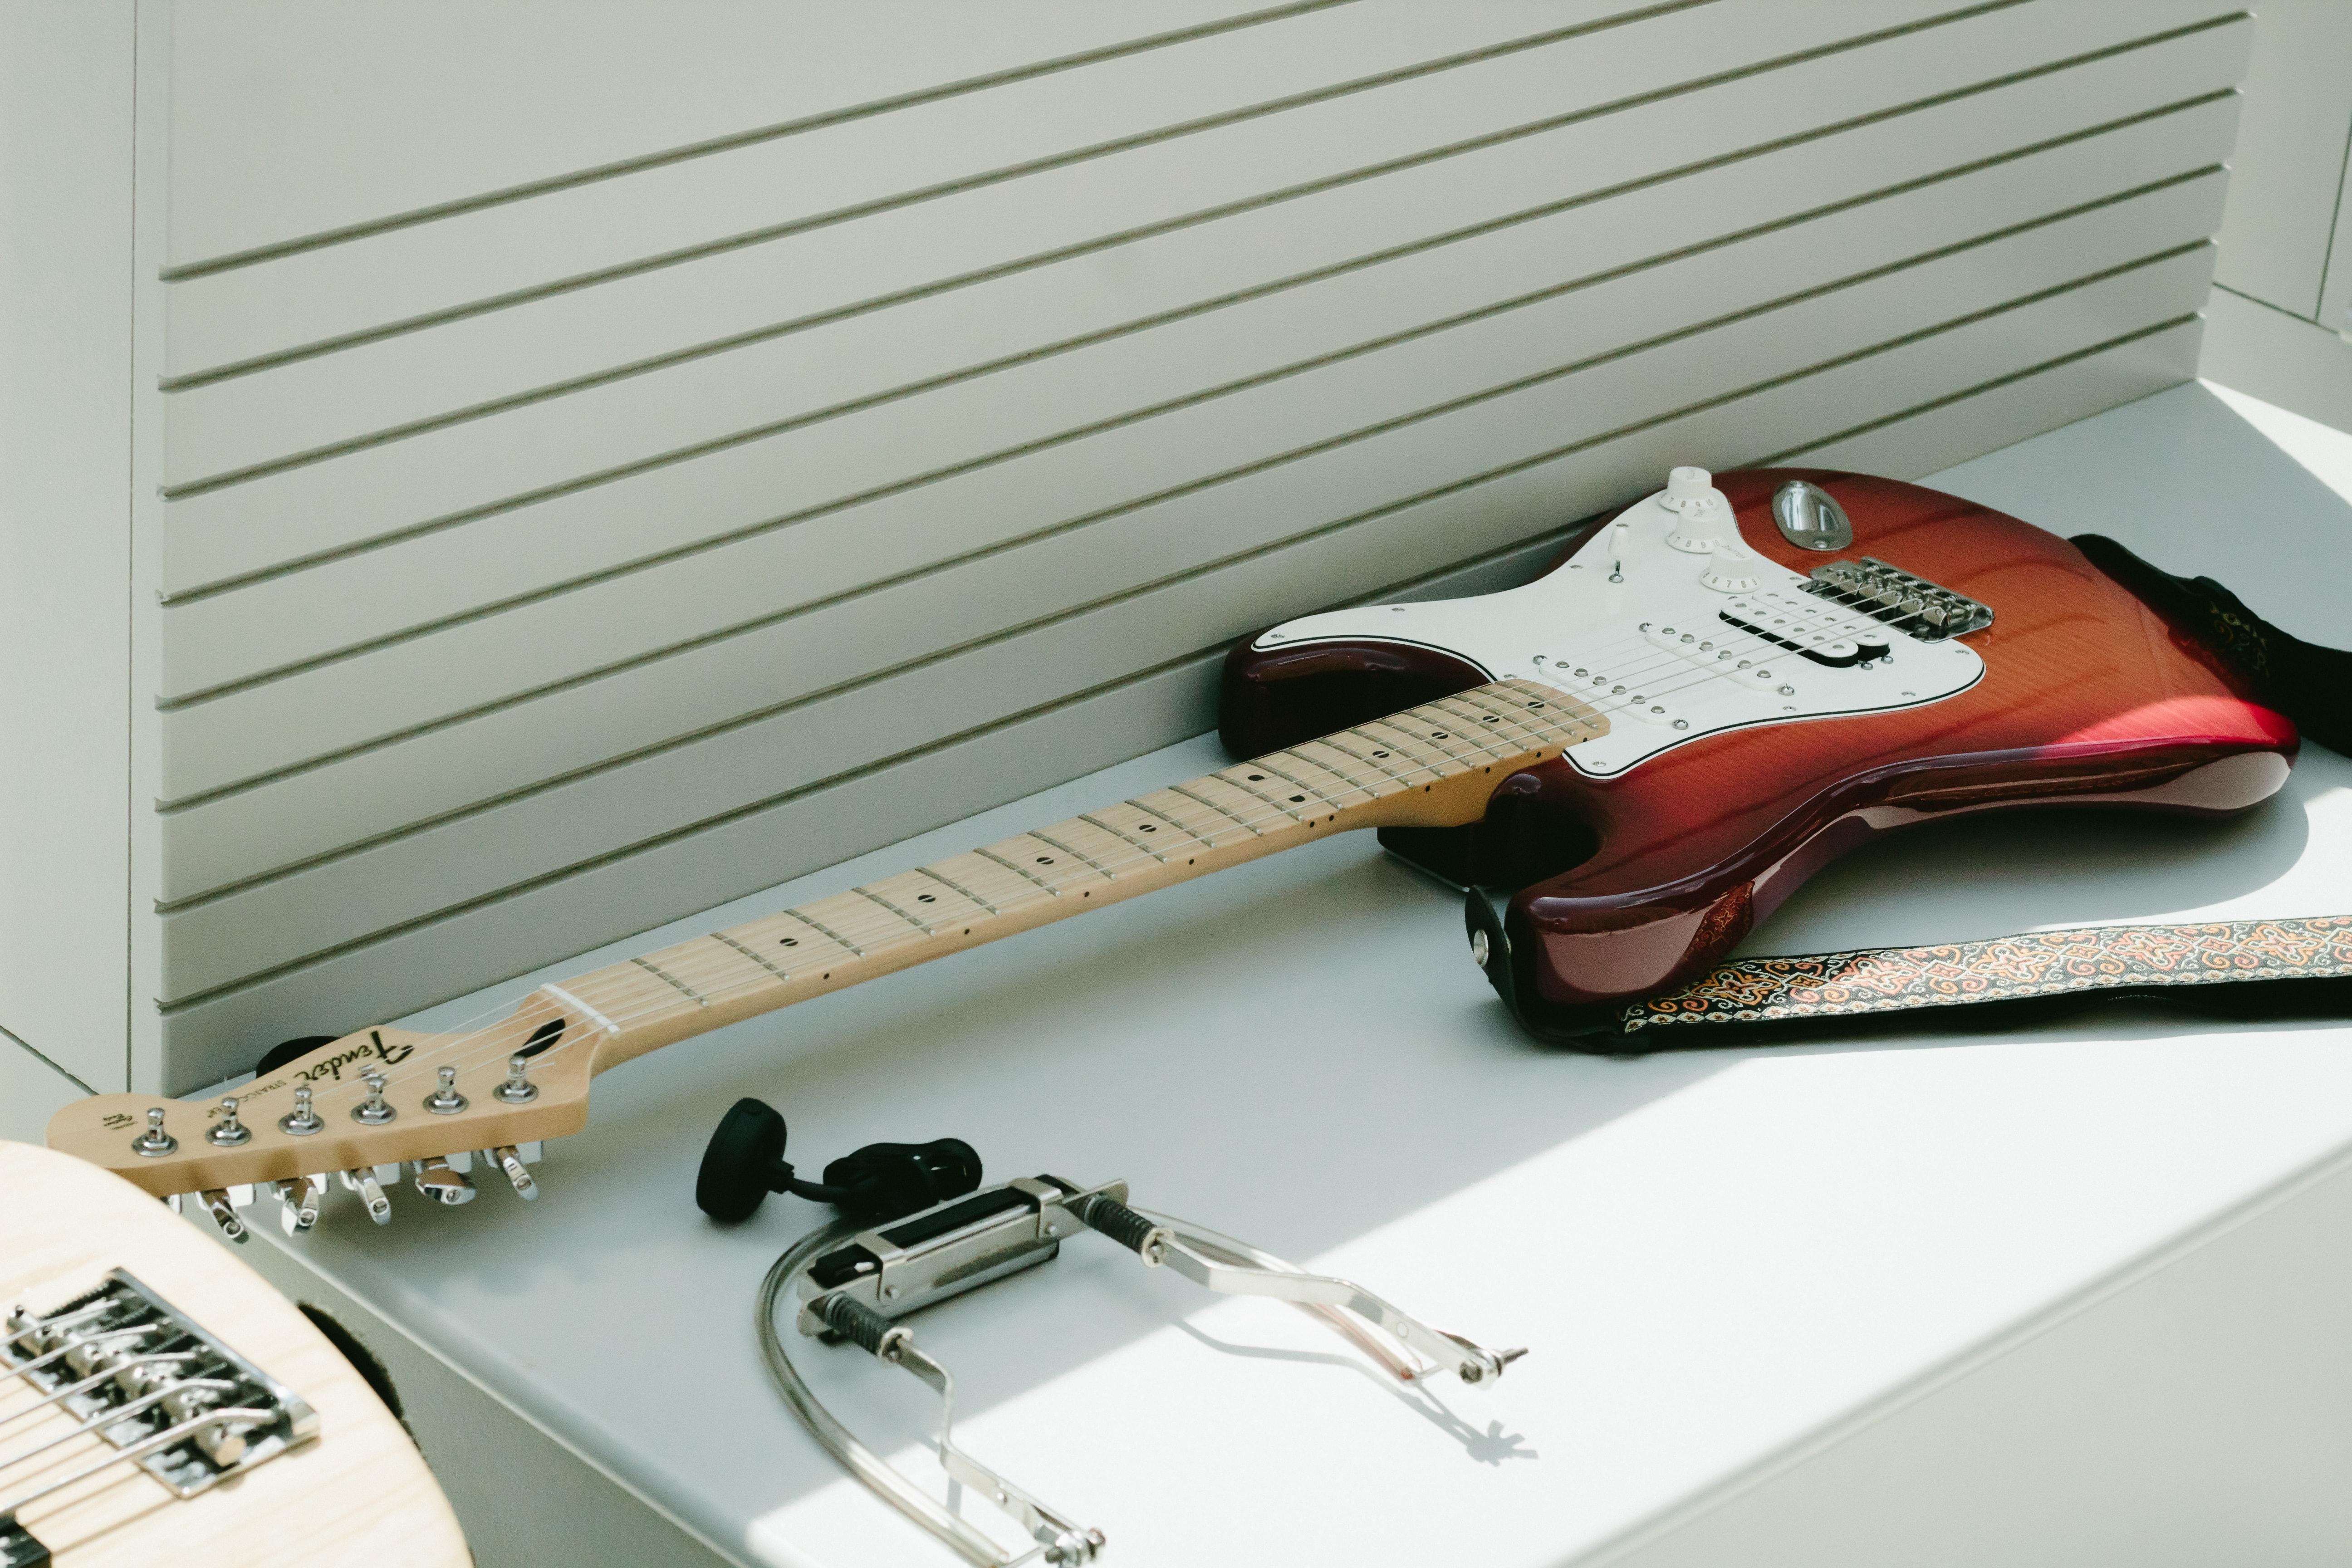 Guitarra electrica Fender de segunda mano